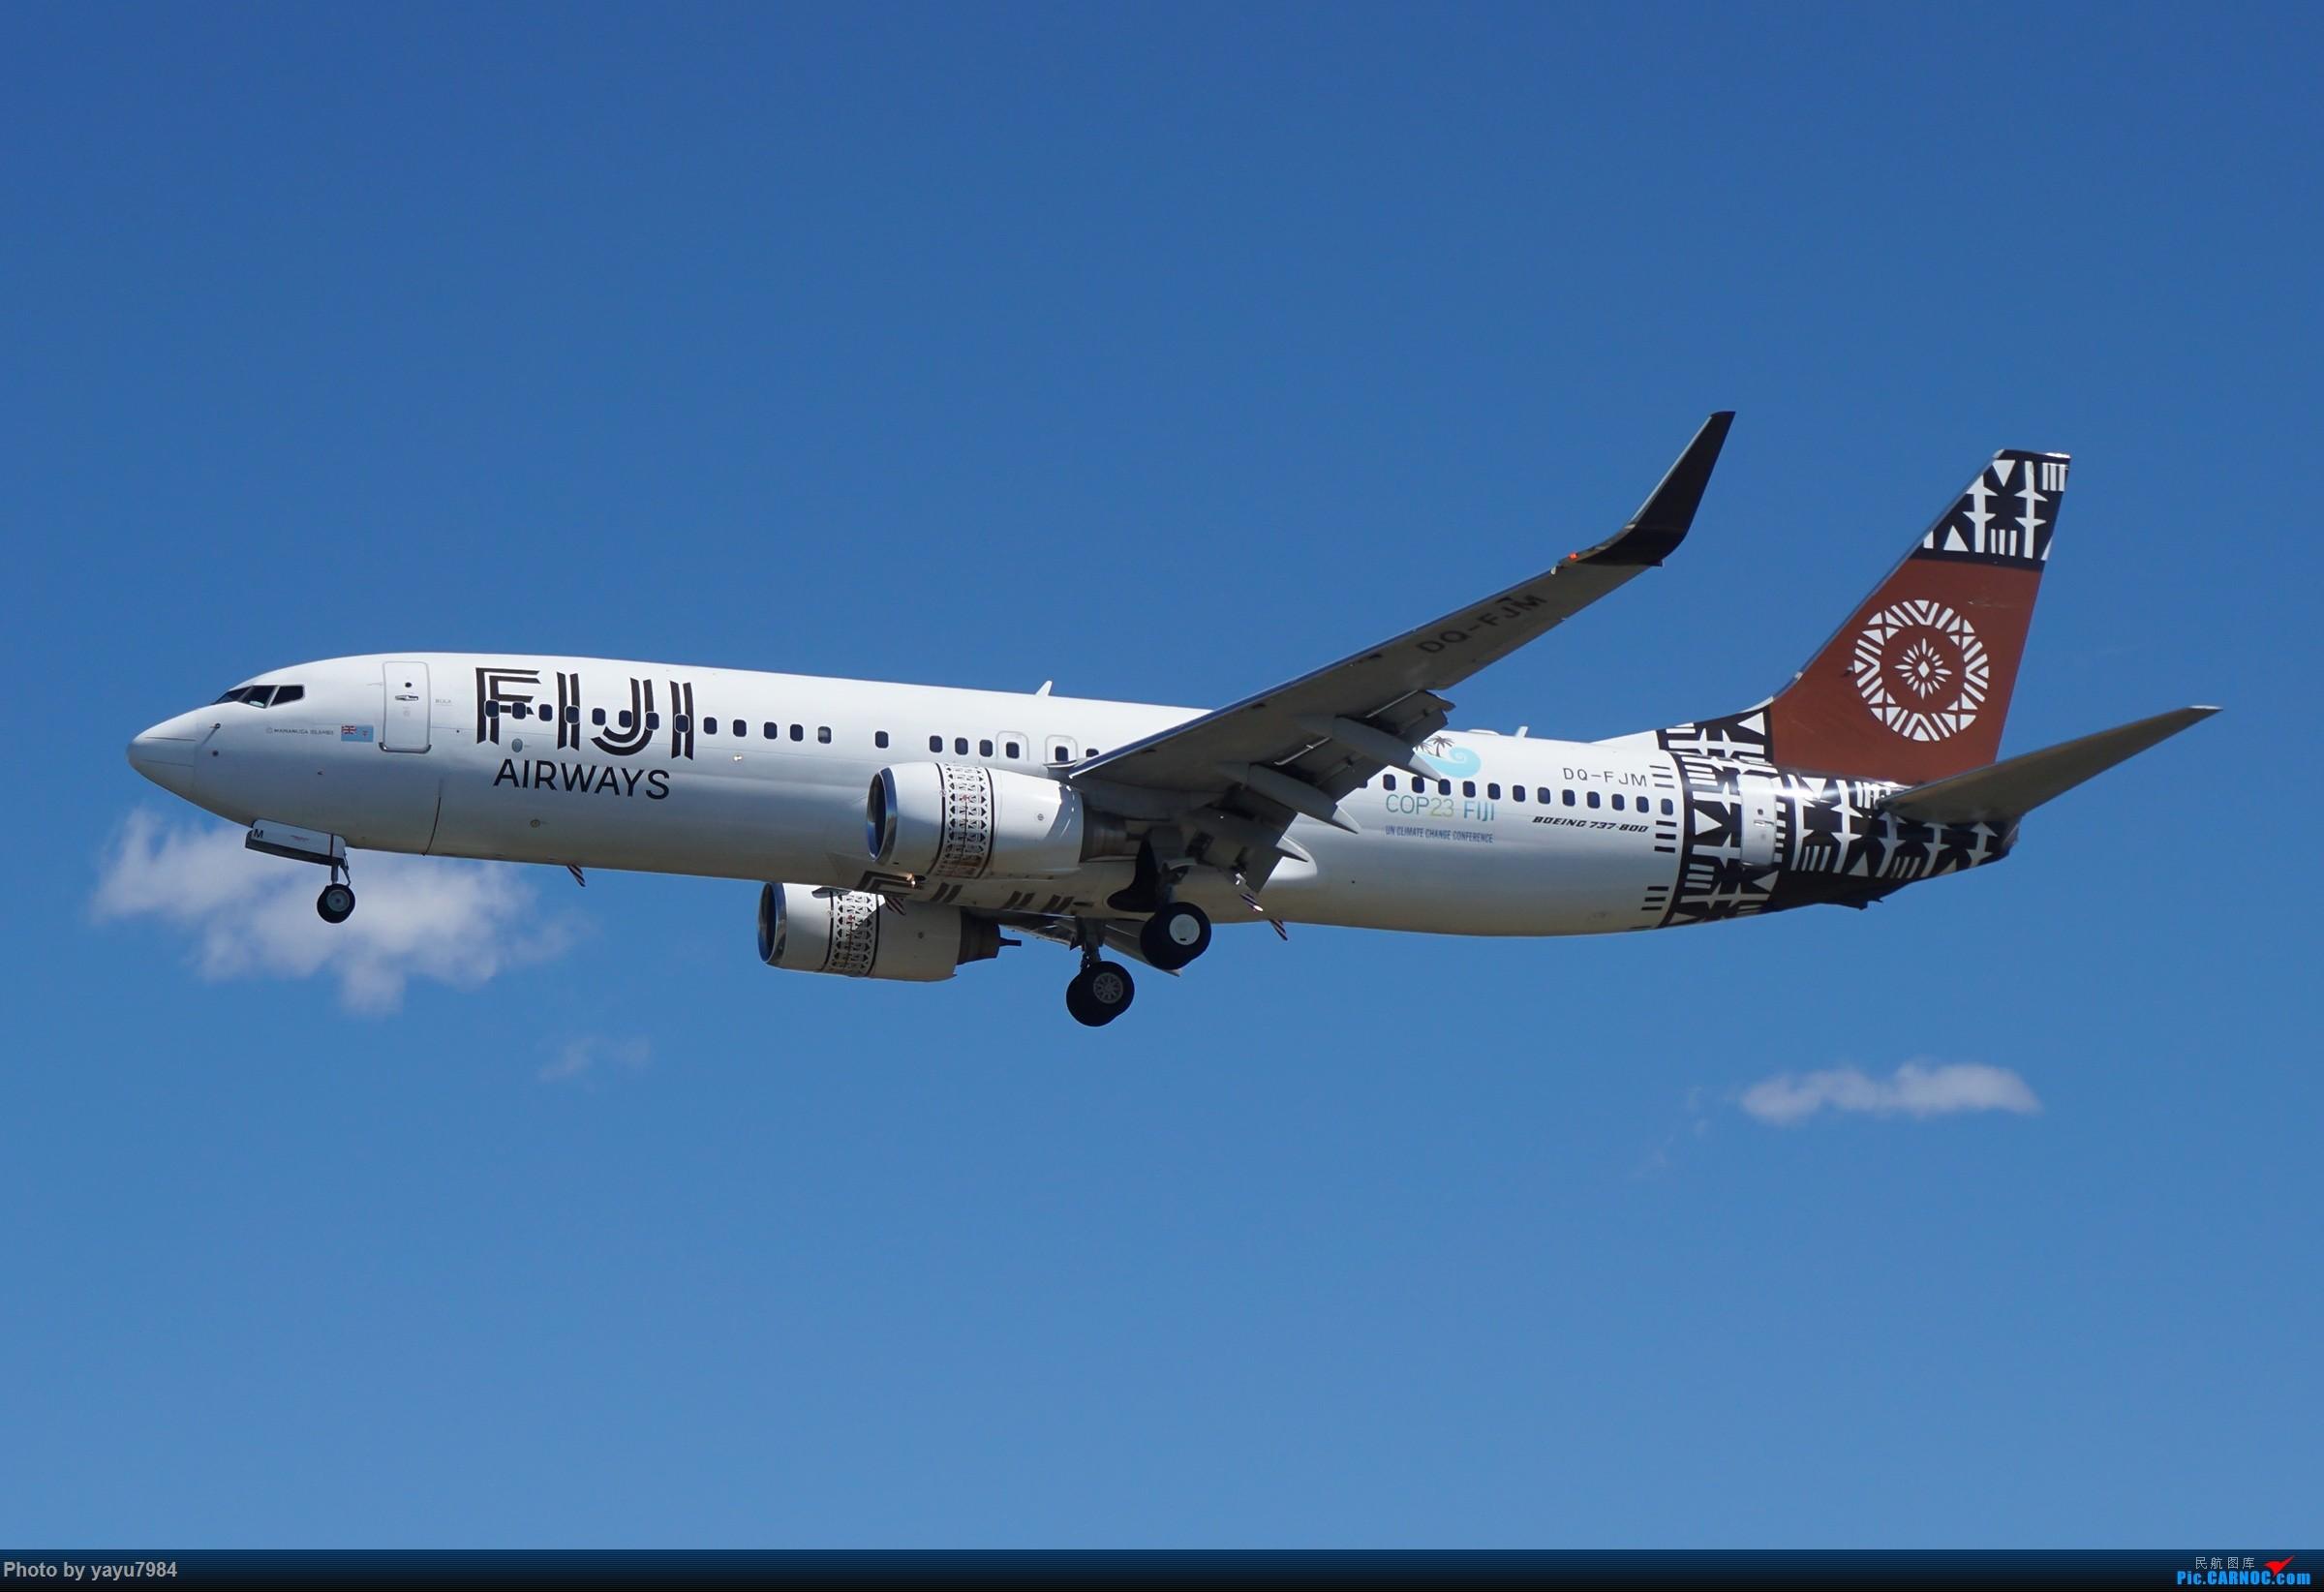 Re:[原创][SYD] 东航天合332,雪绒花343,华航蓝鹊,以及其他日常货 BOEING 737-800 DQ-FJM 澳大利亚悉尼金斯福德·史密斯机场